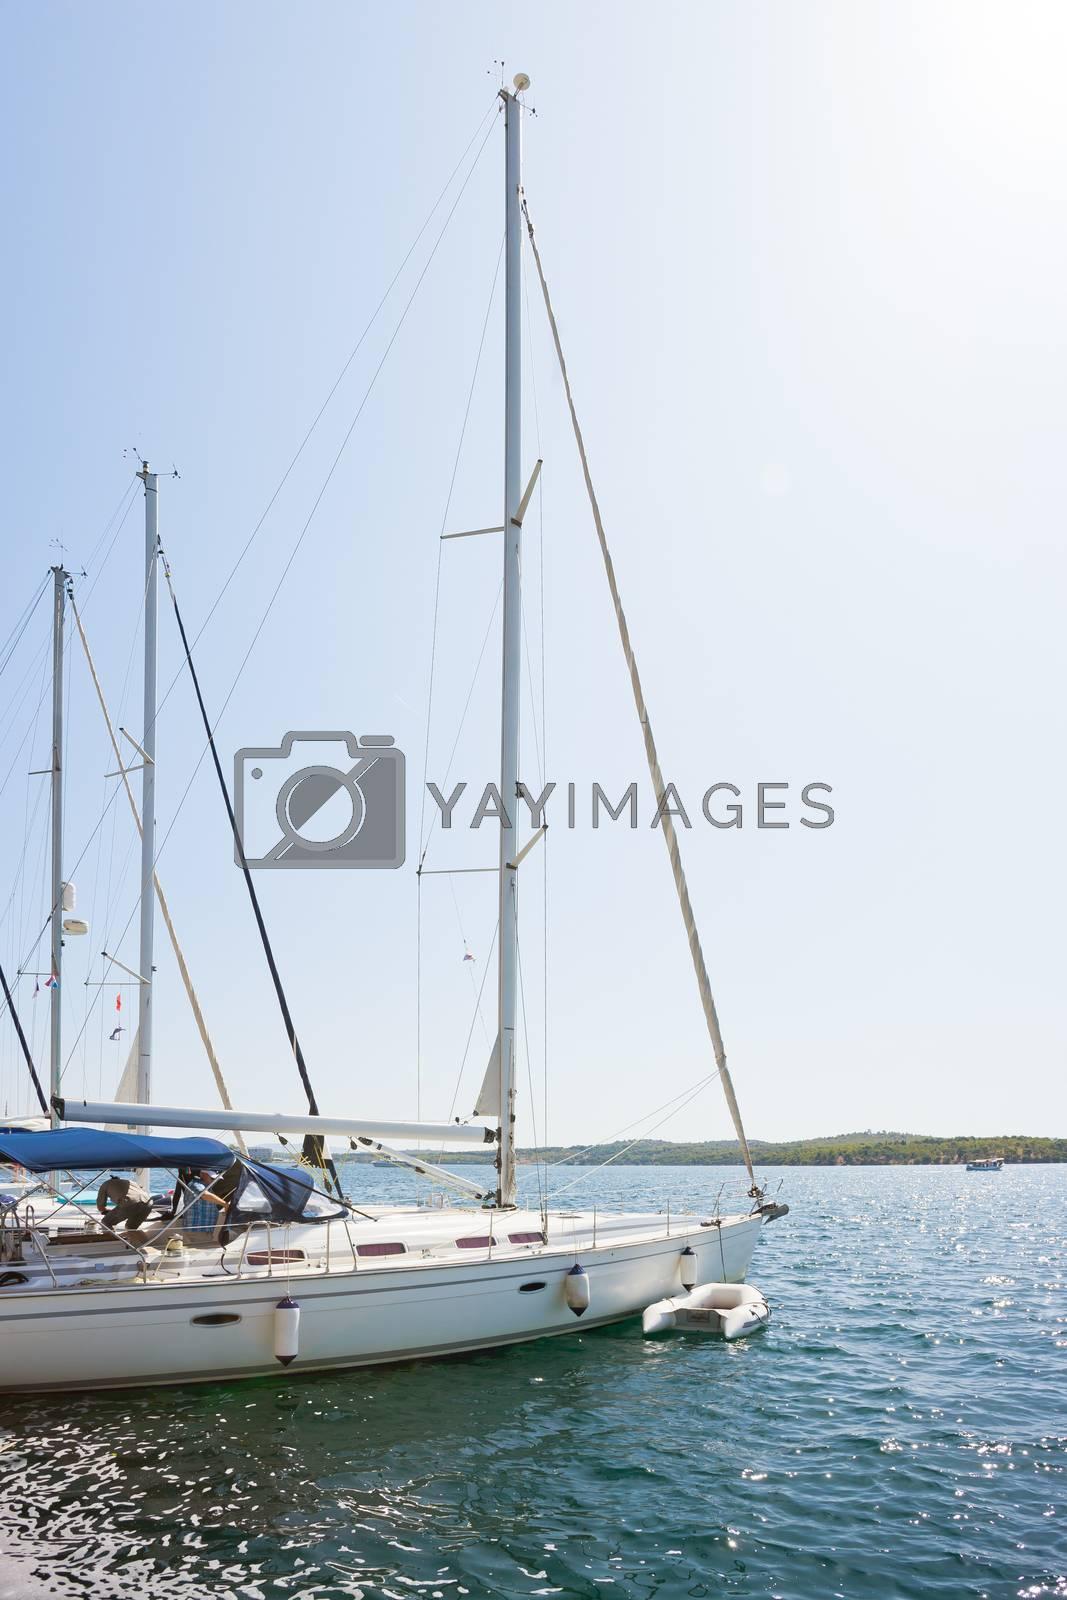 Sibenik, Croatia, Europe - Sailing boats at the harbor of Sibenik